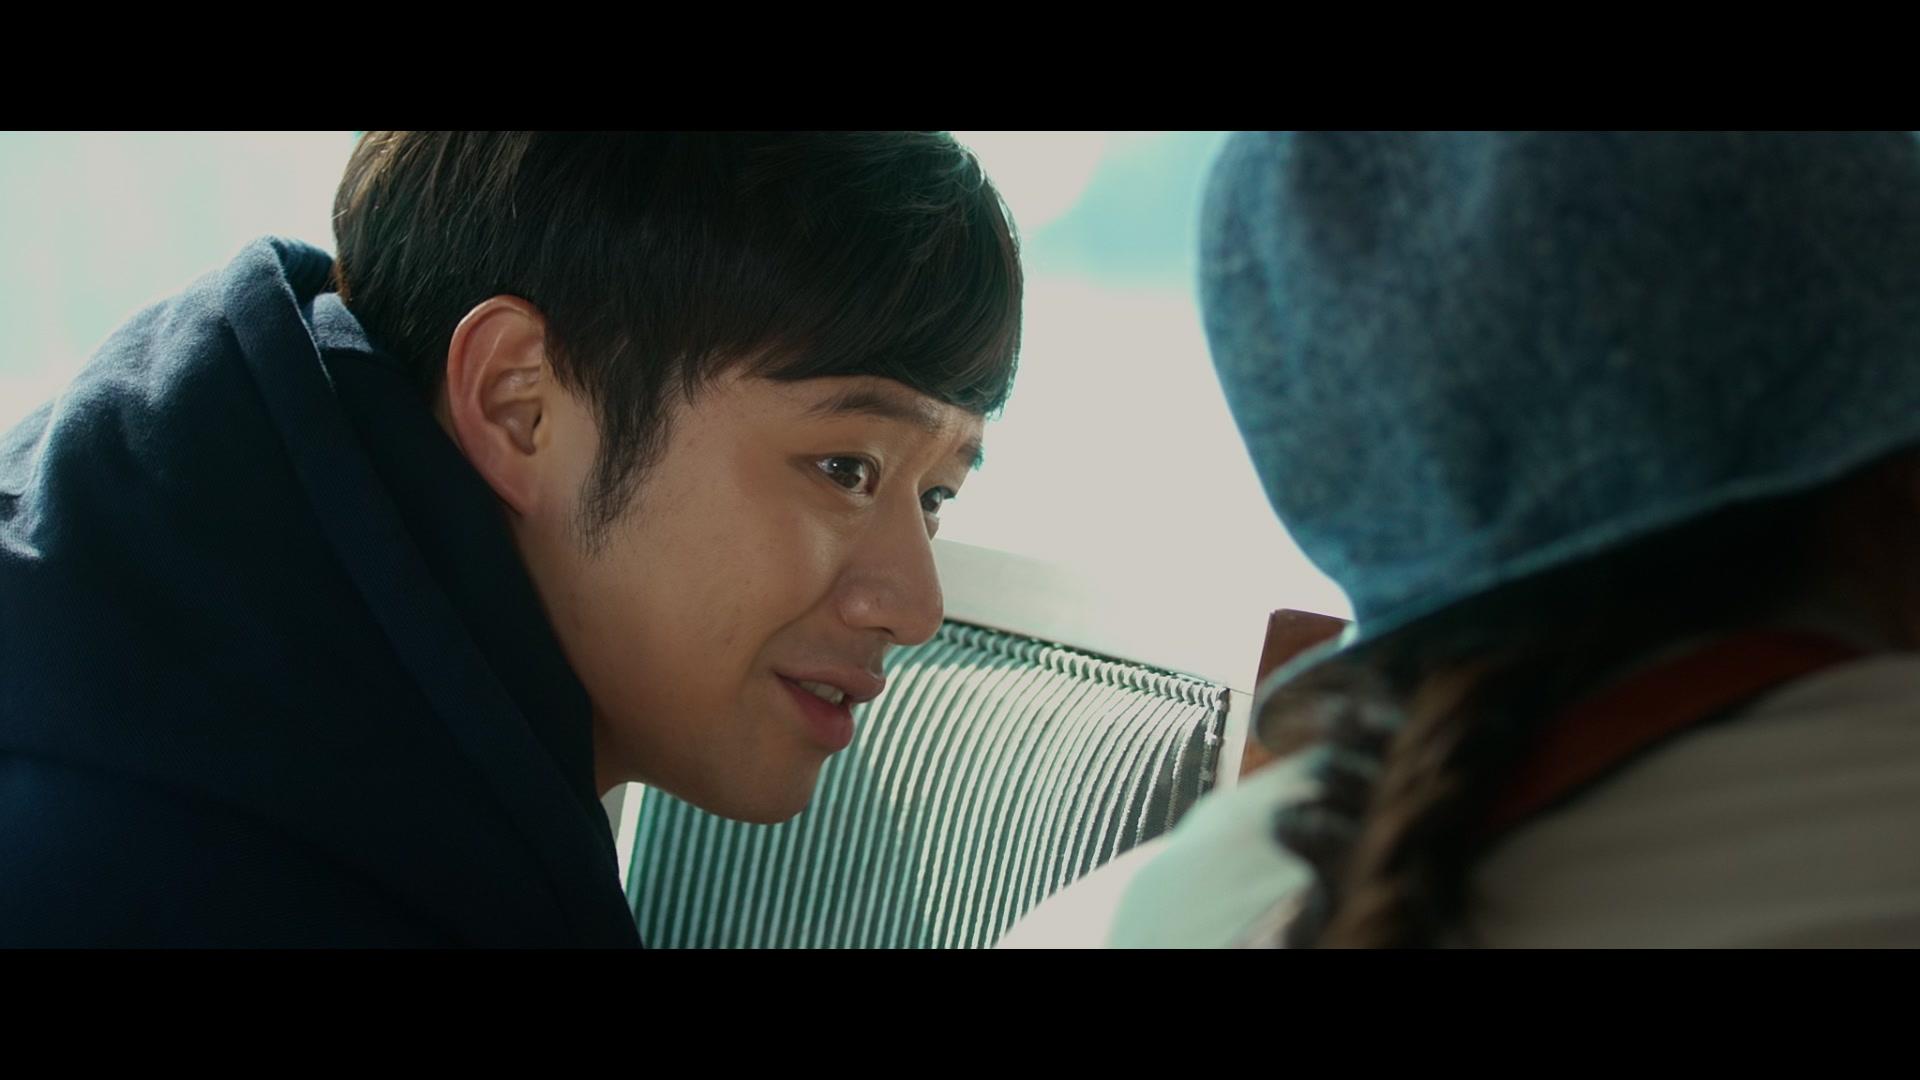 Trailer: Life Risking Romance